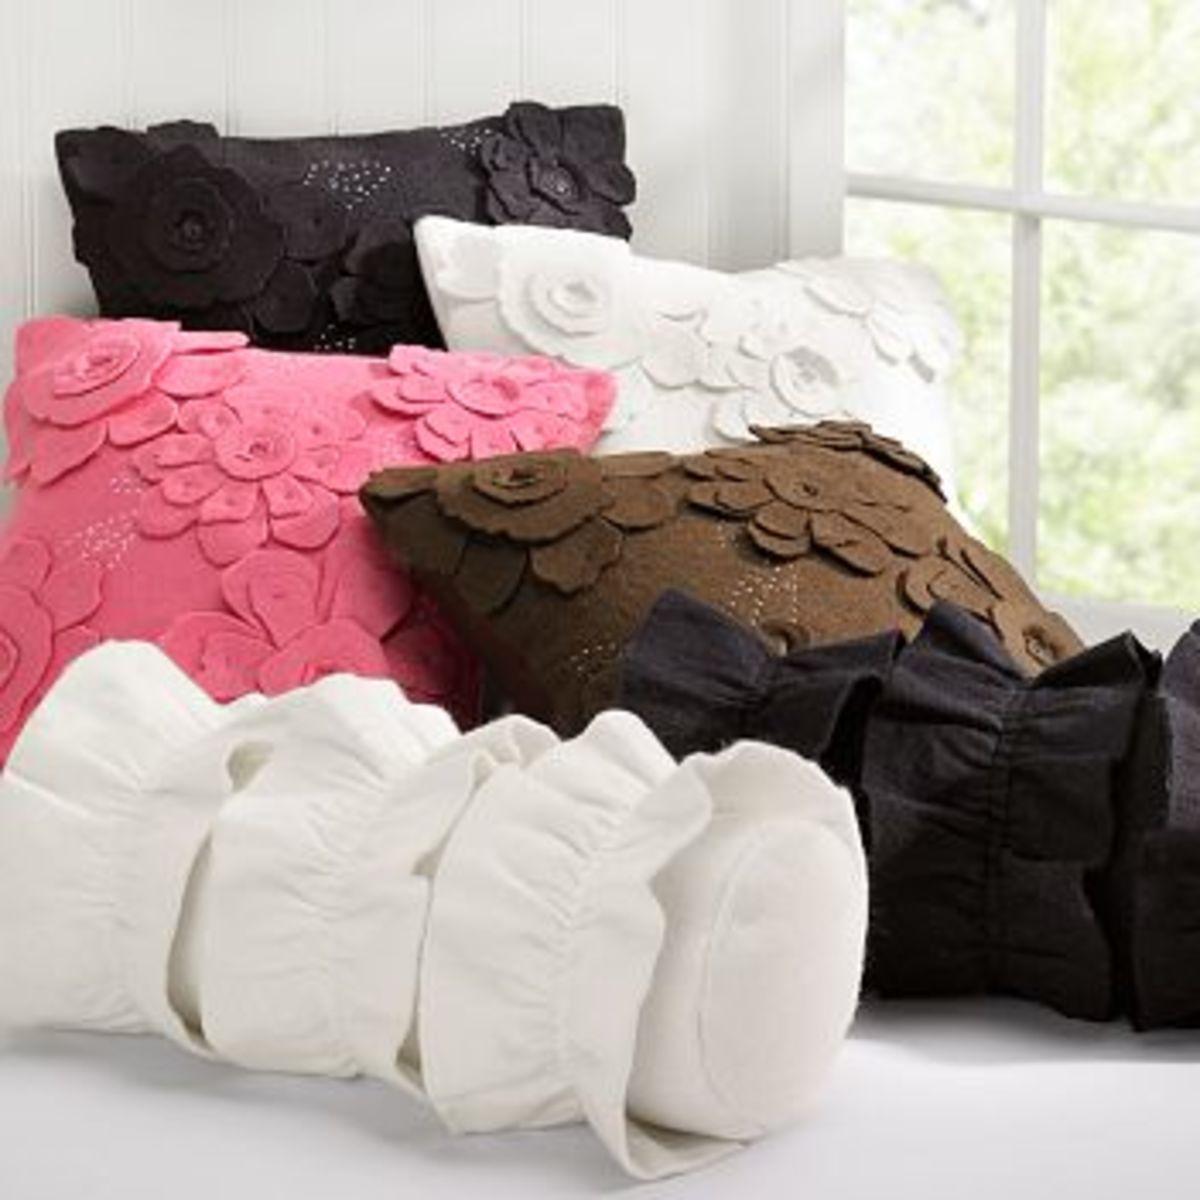 DIY Pottery Barn Knock-Off Pillows